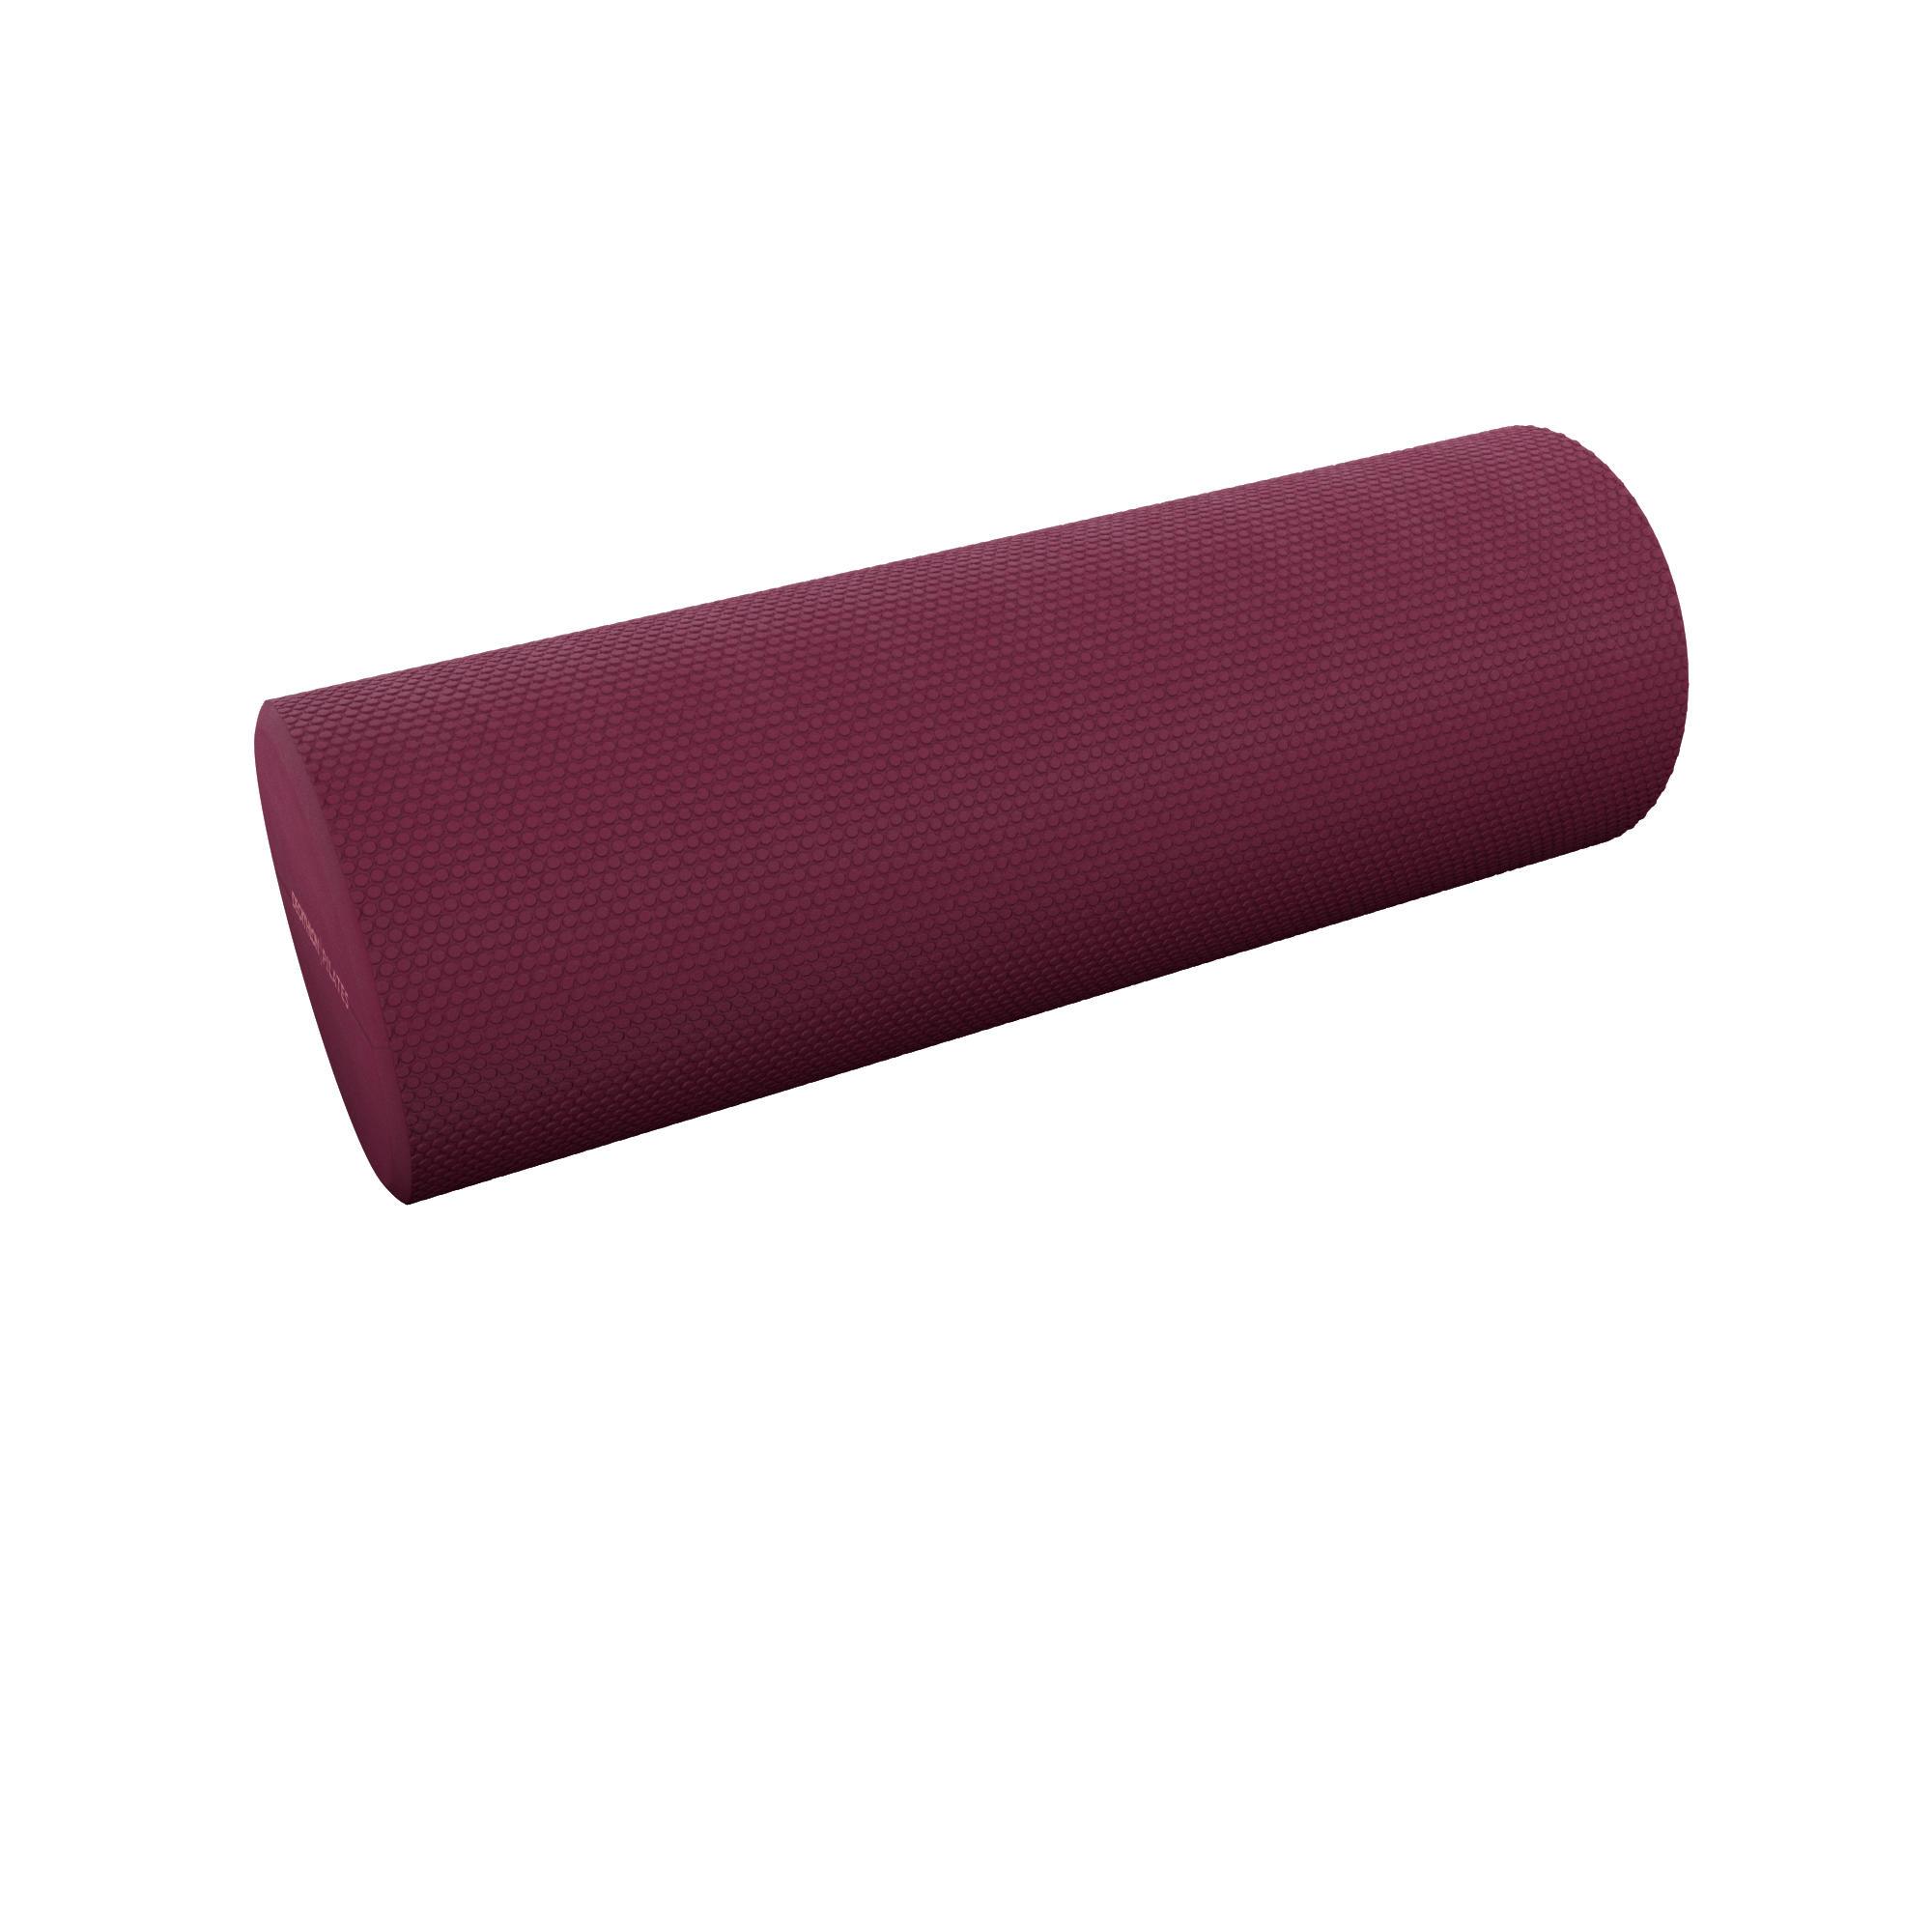 Mini Foam Roller Pilates Domyos Violeta 38 cm